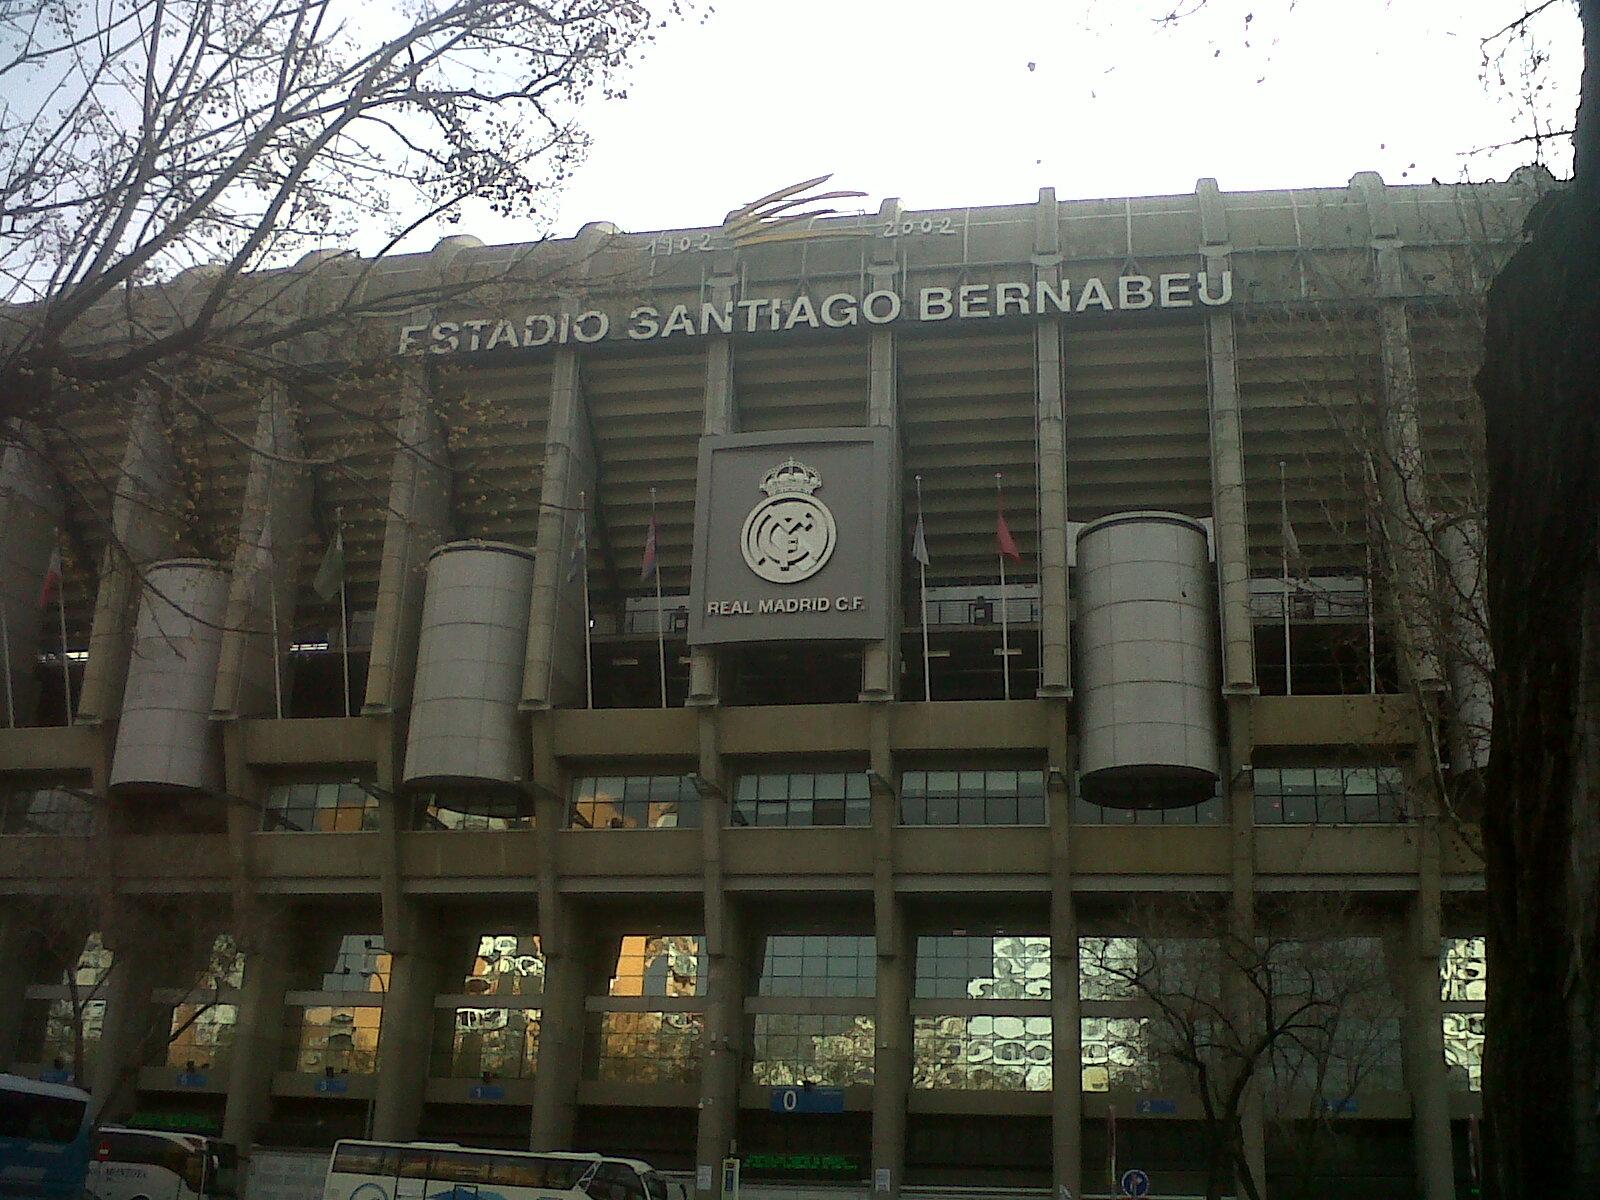 mad real madrid estadio santiago bernabeu emblem feb13